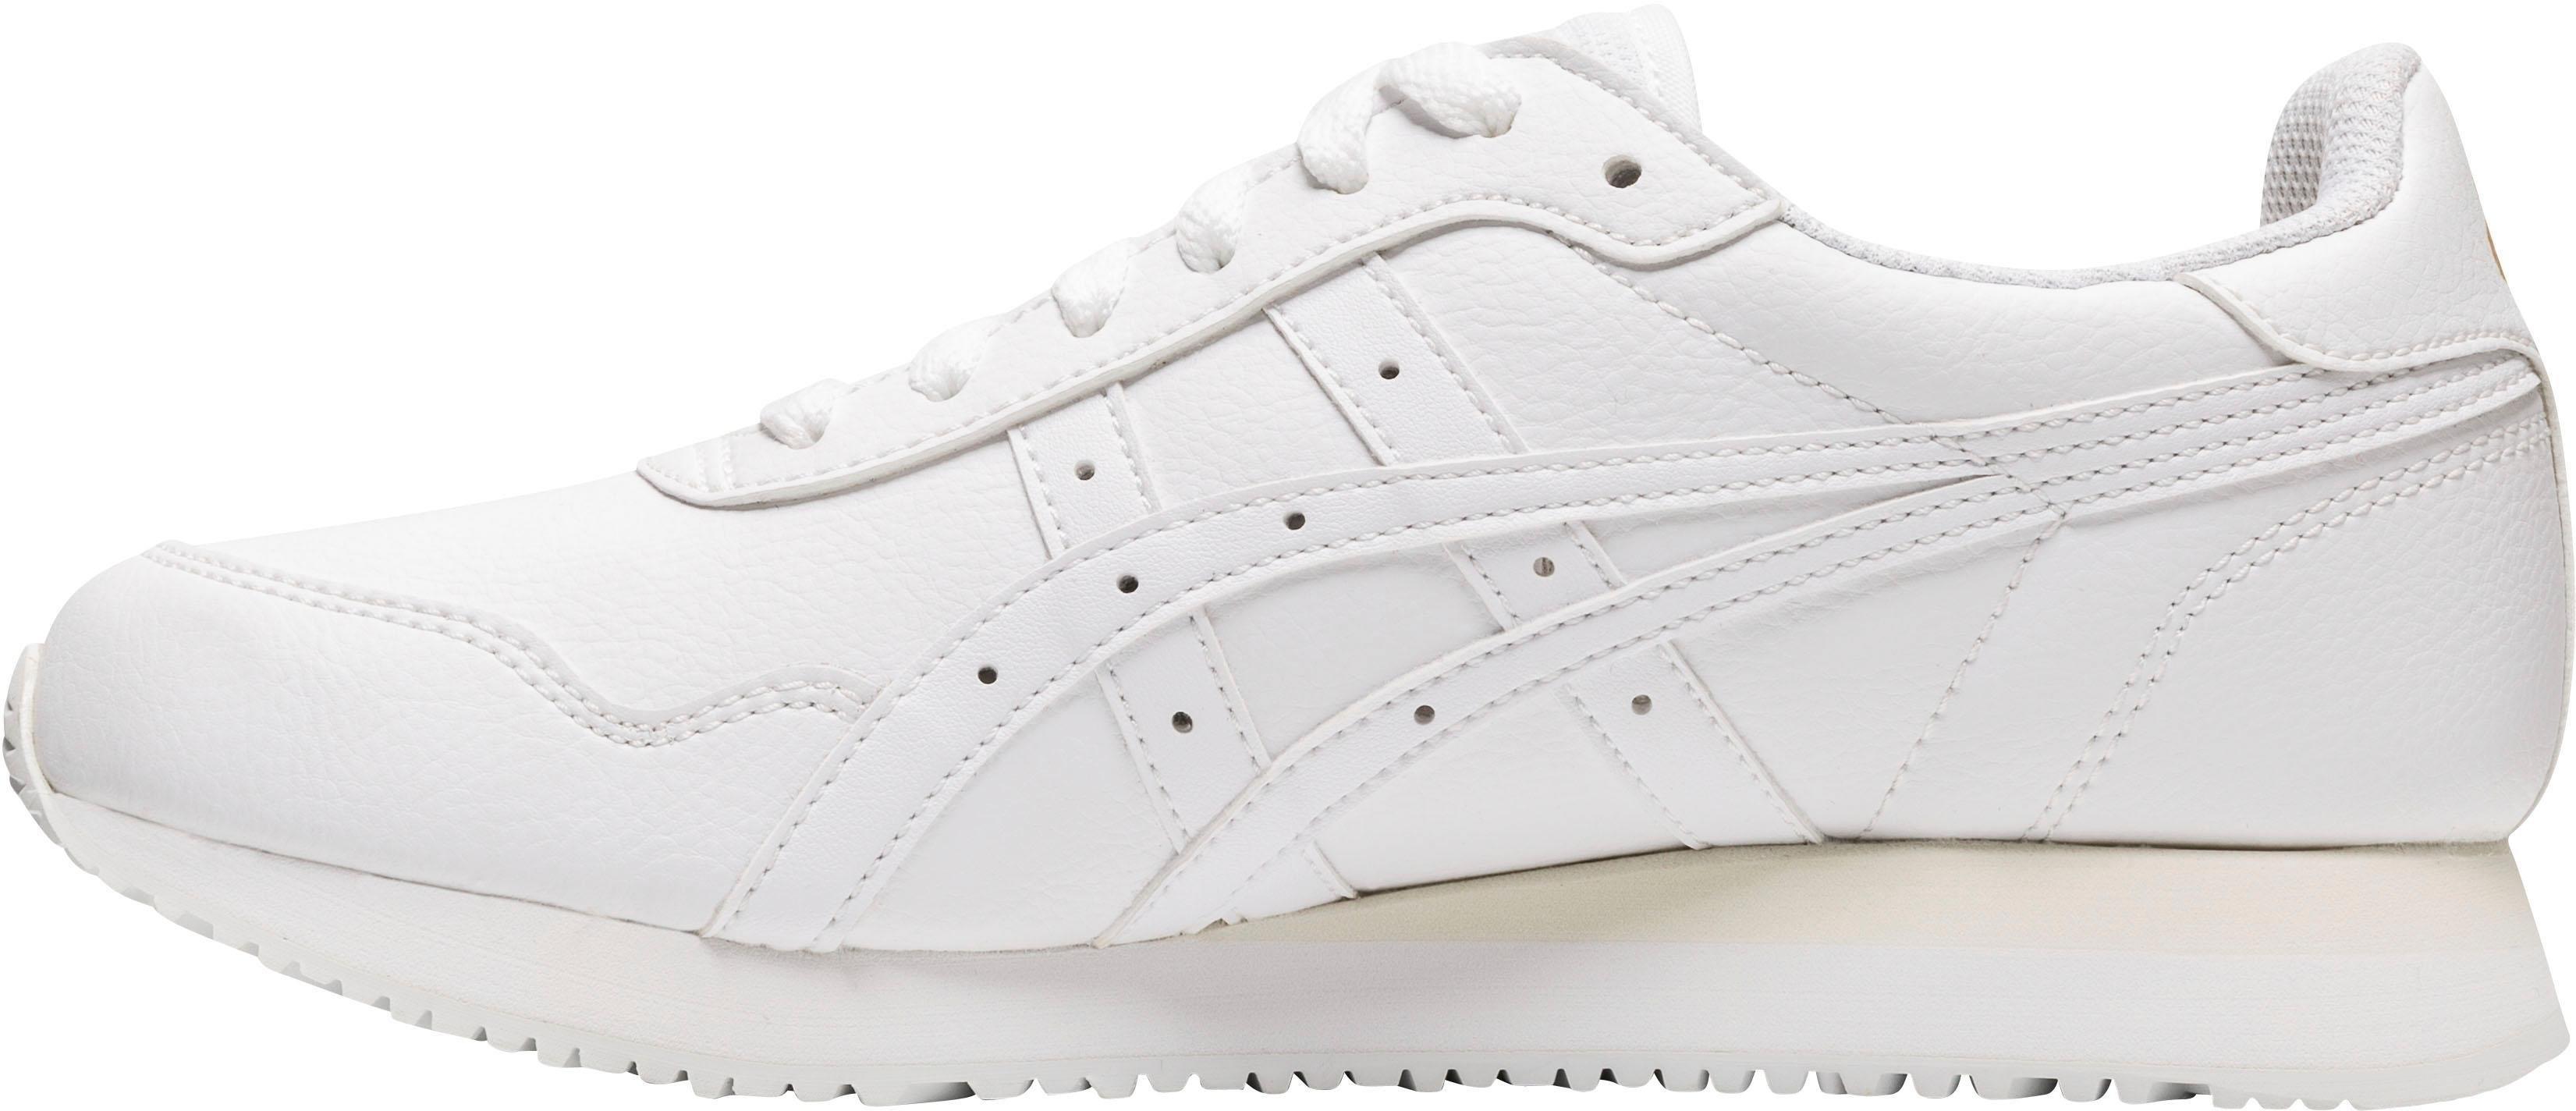 ASICS tiger sneakers »TIGER RUNNER« - gratis ruilen op otto.nl